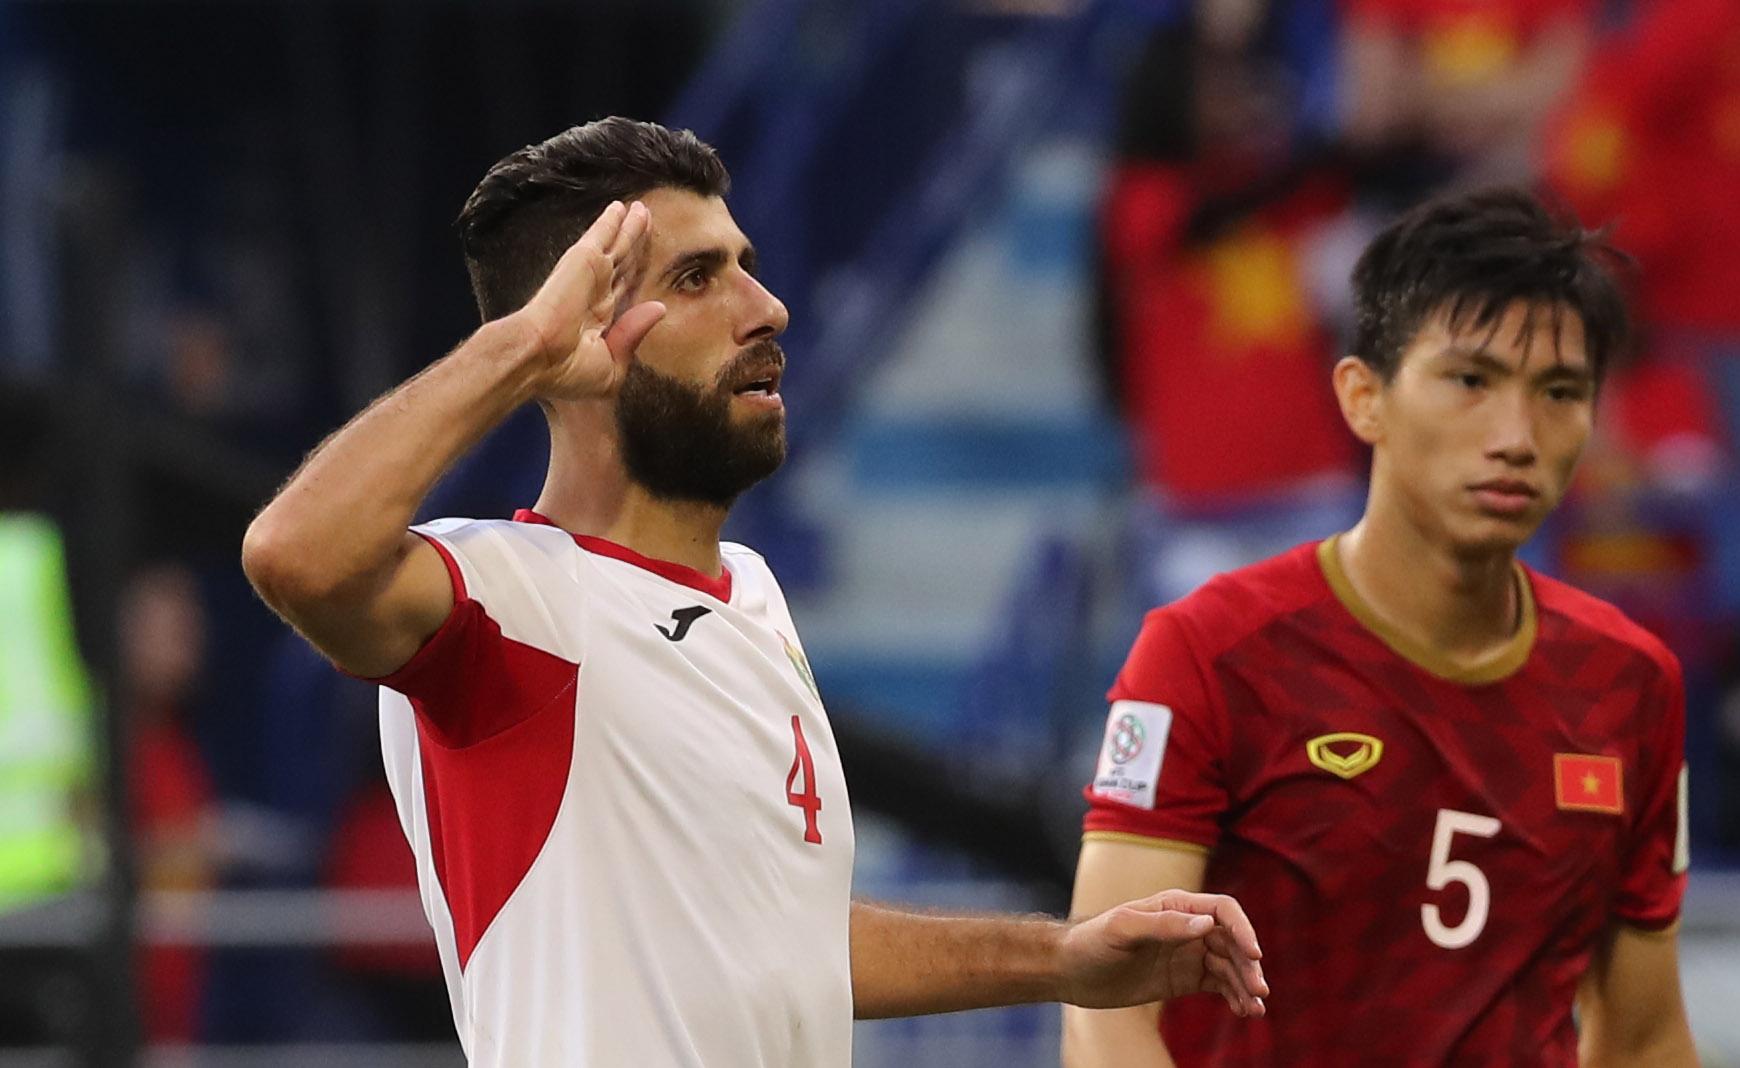 Baha Abdel-Rahman, scored the first goal for Jordan (Asian Football Confederation (AFC))